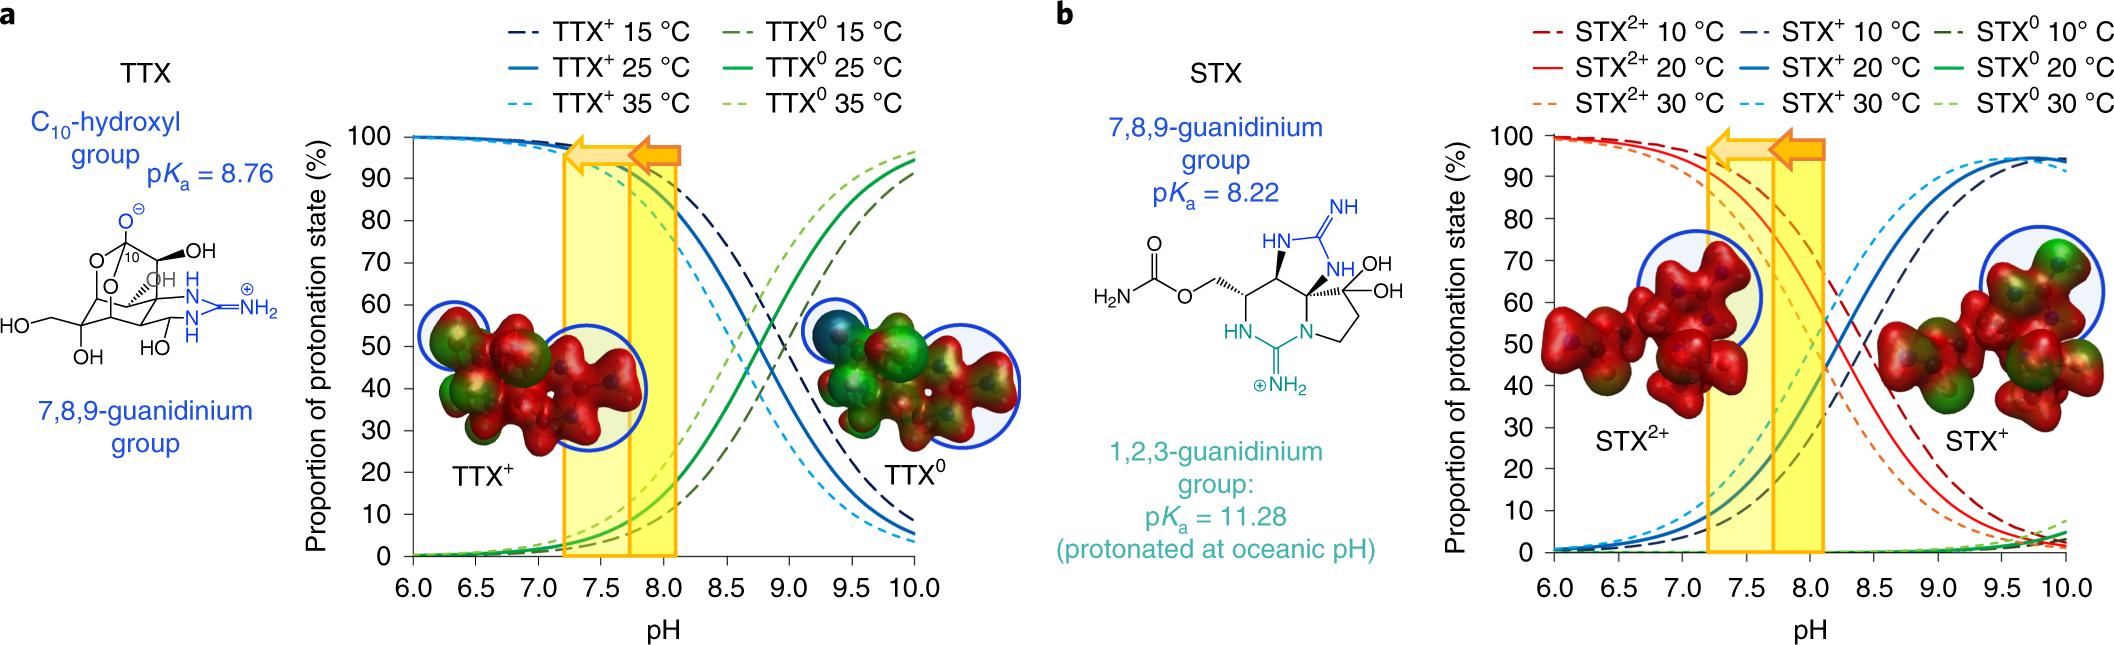 Saxitoxin and tetrodotoxin bioavailability increases in future oceans